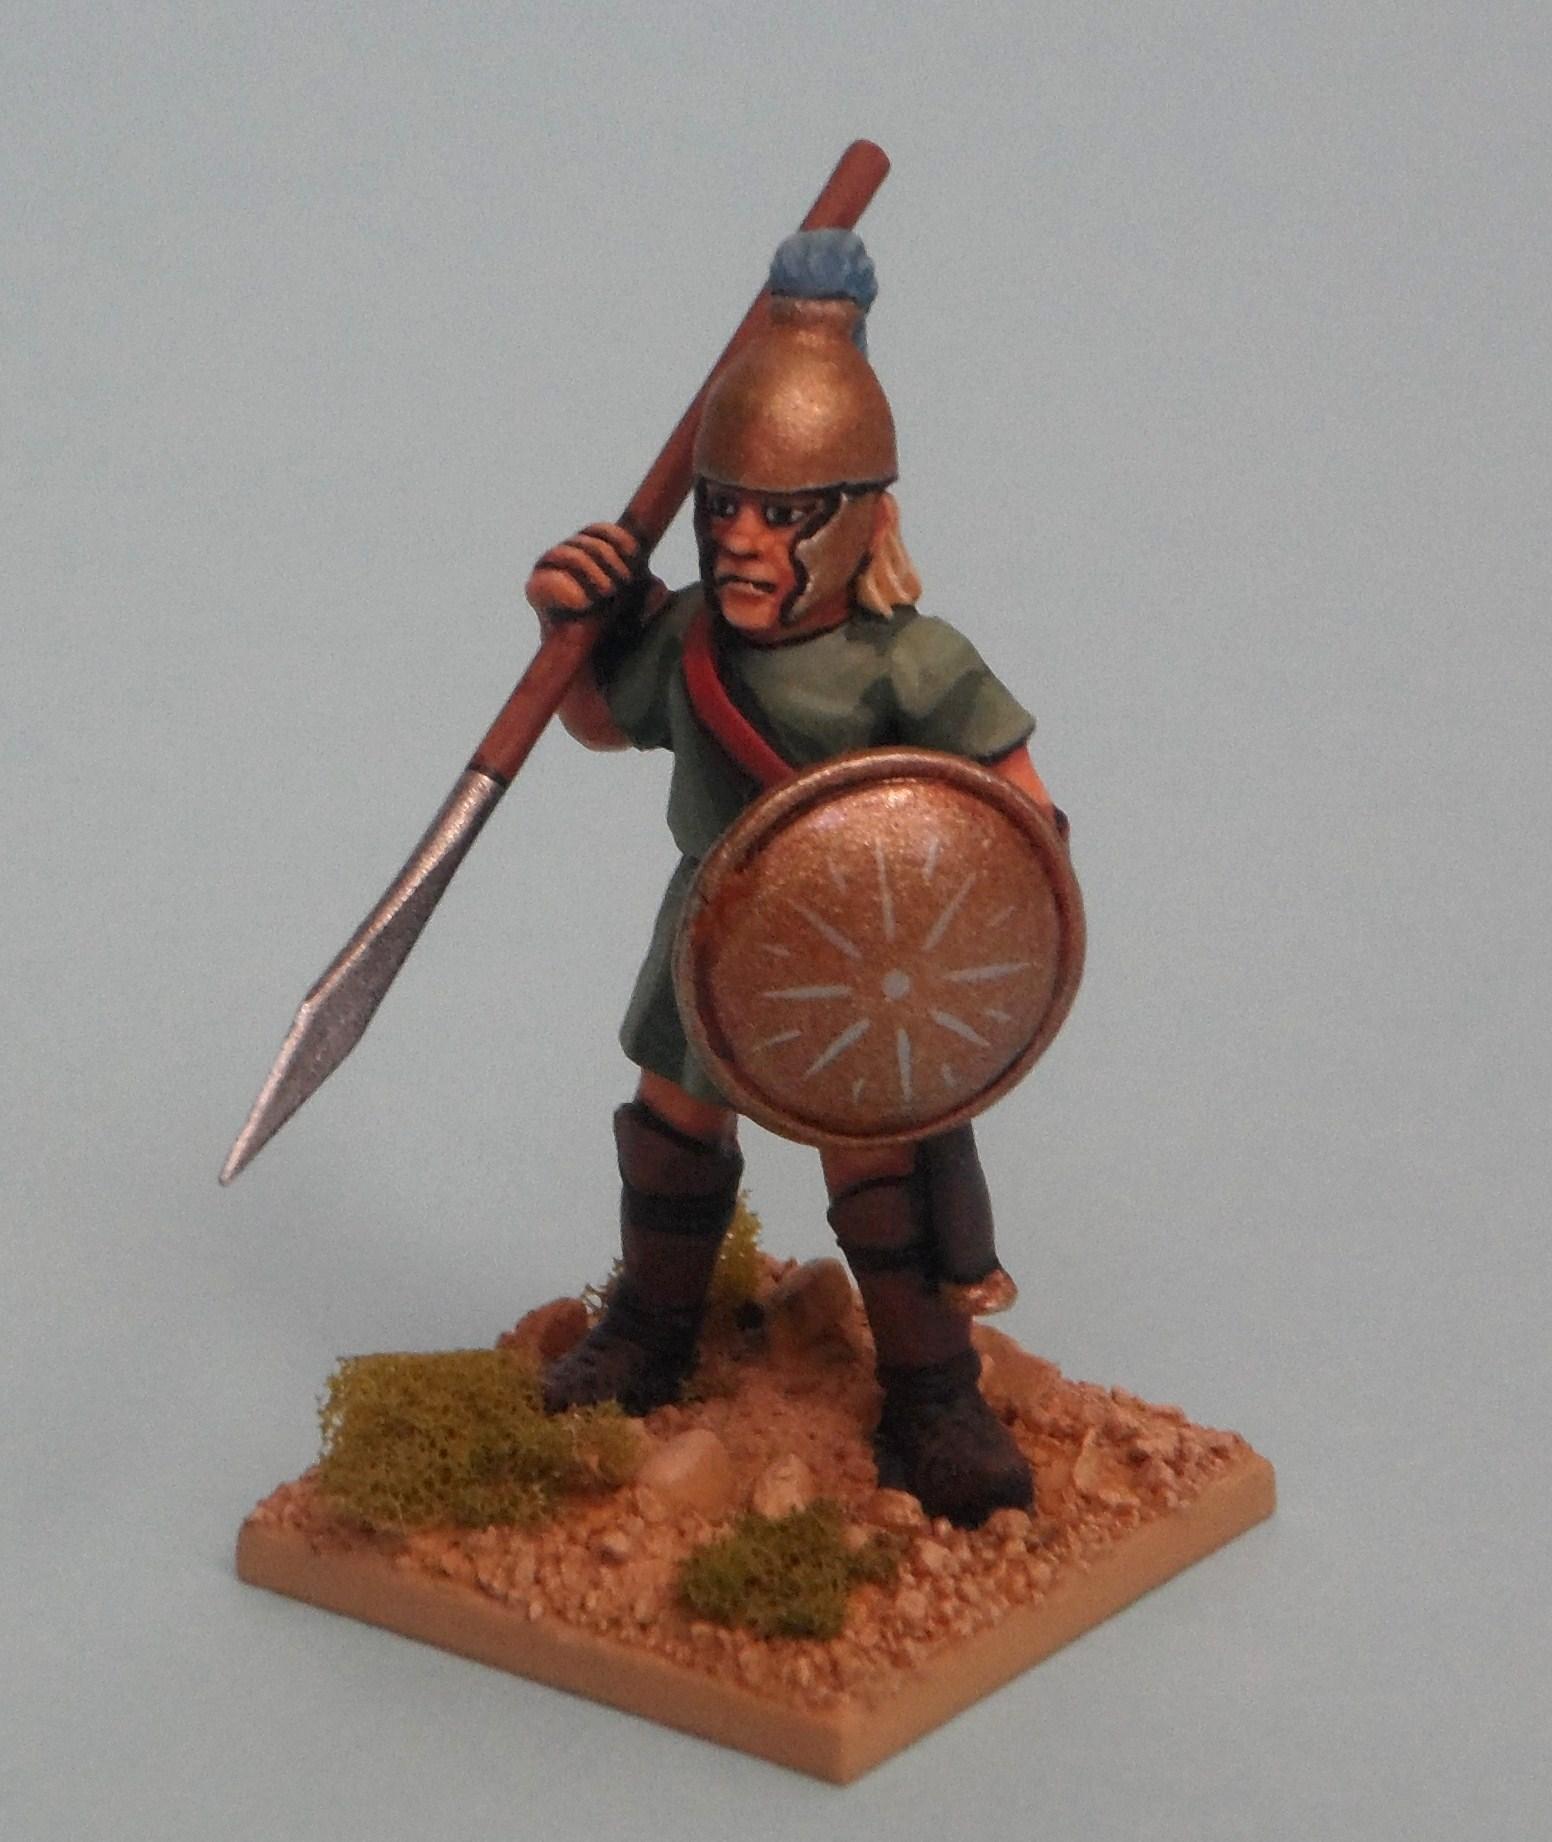 Alexander, Barbarian, Foundry, Historical, Javelin, Javelinman, Light, Paeonian, Trojan